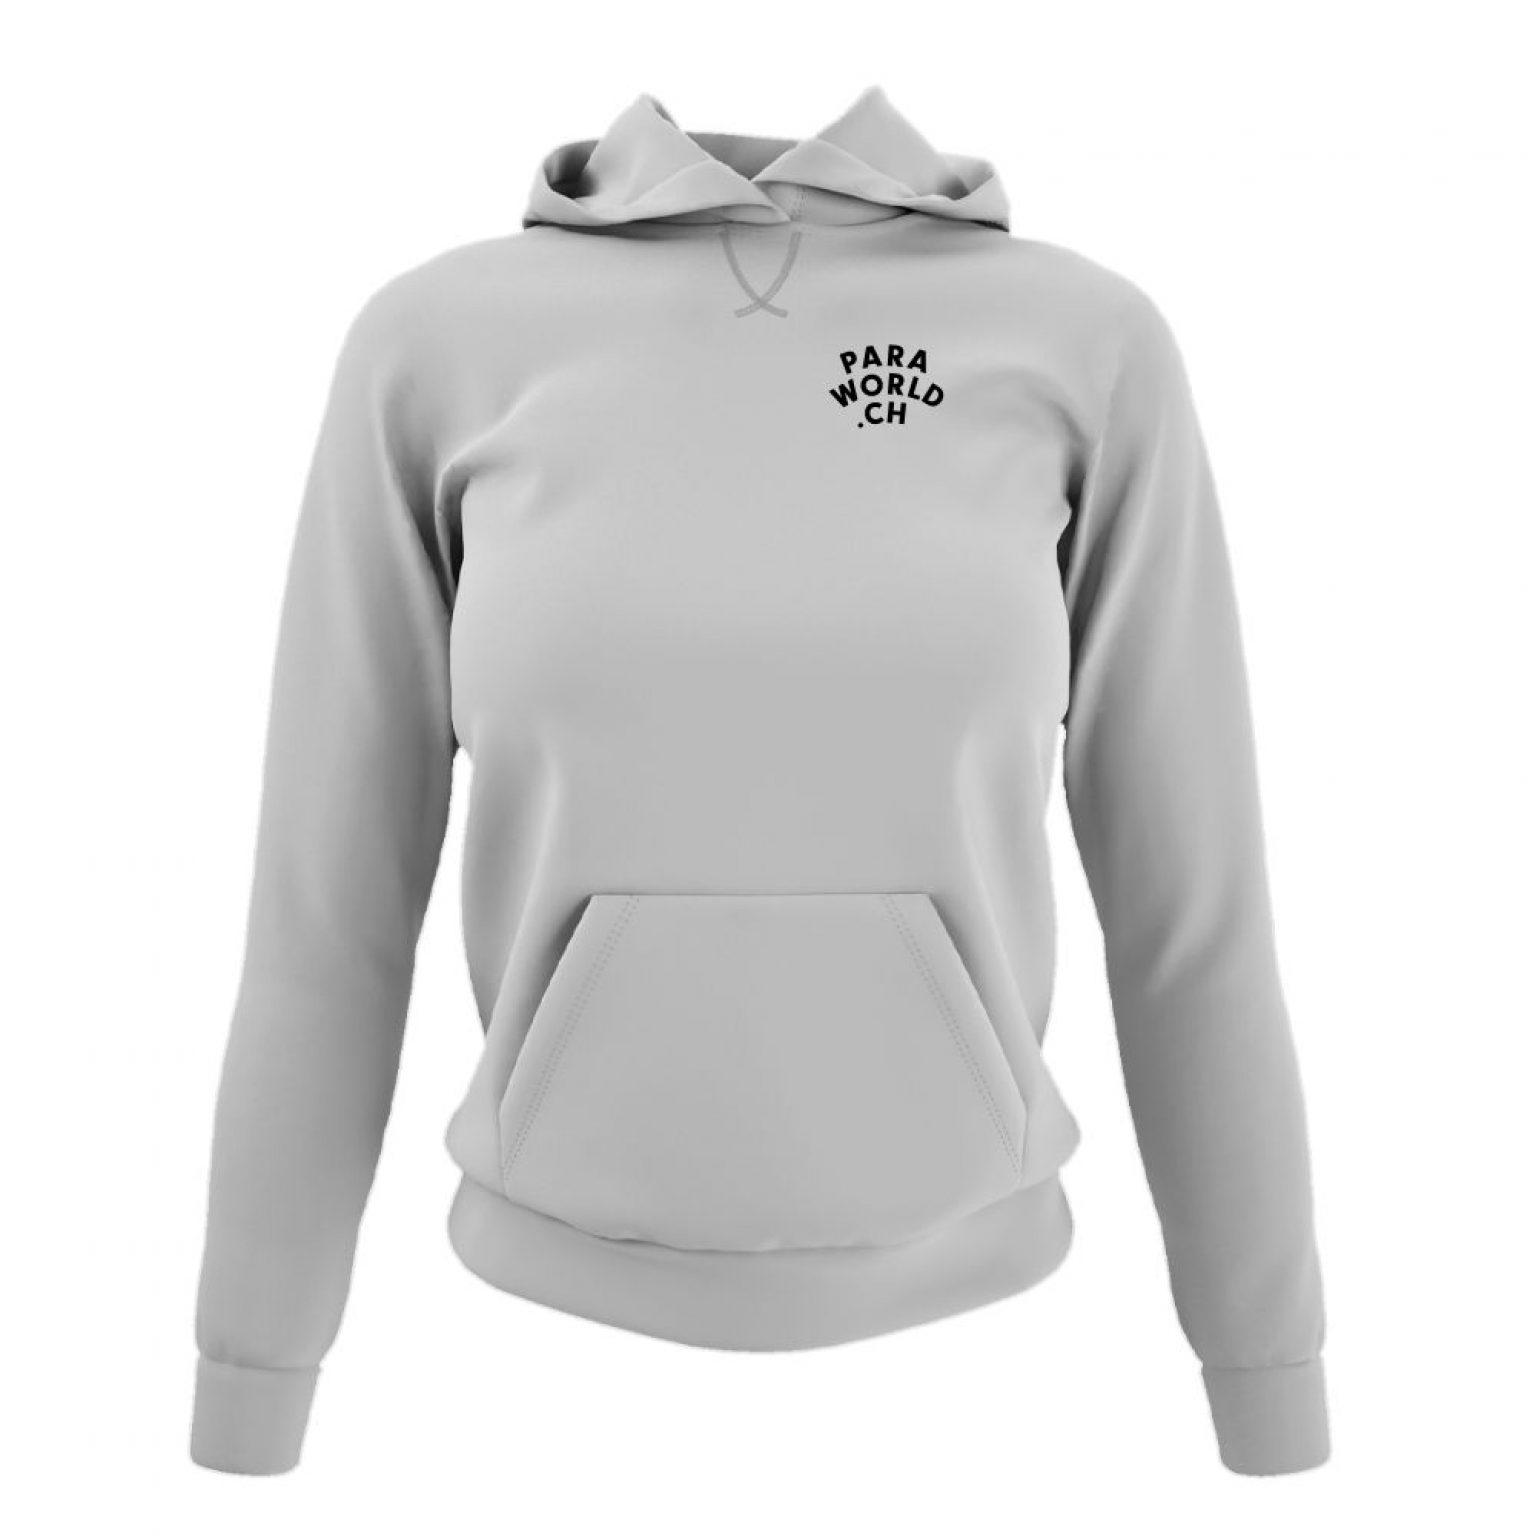 JTA b hoodie damen oxford front